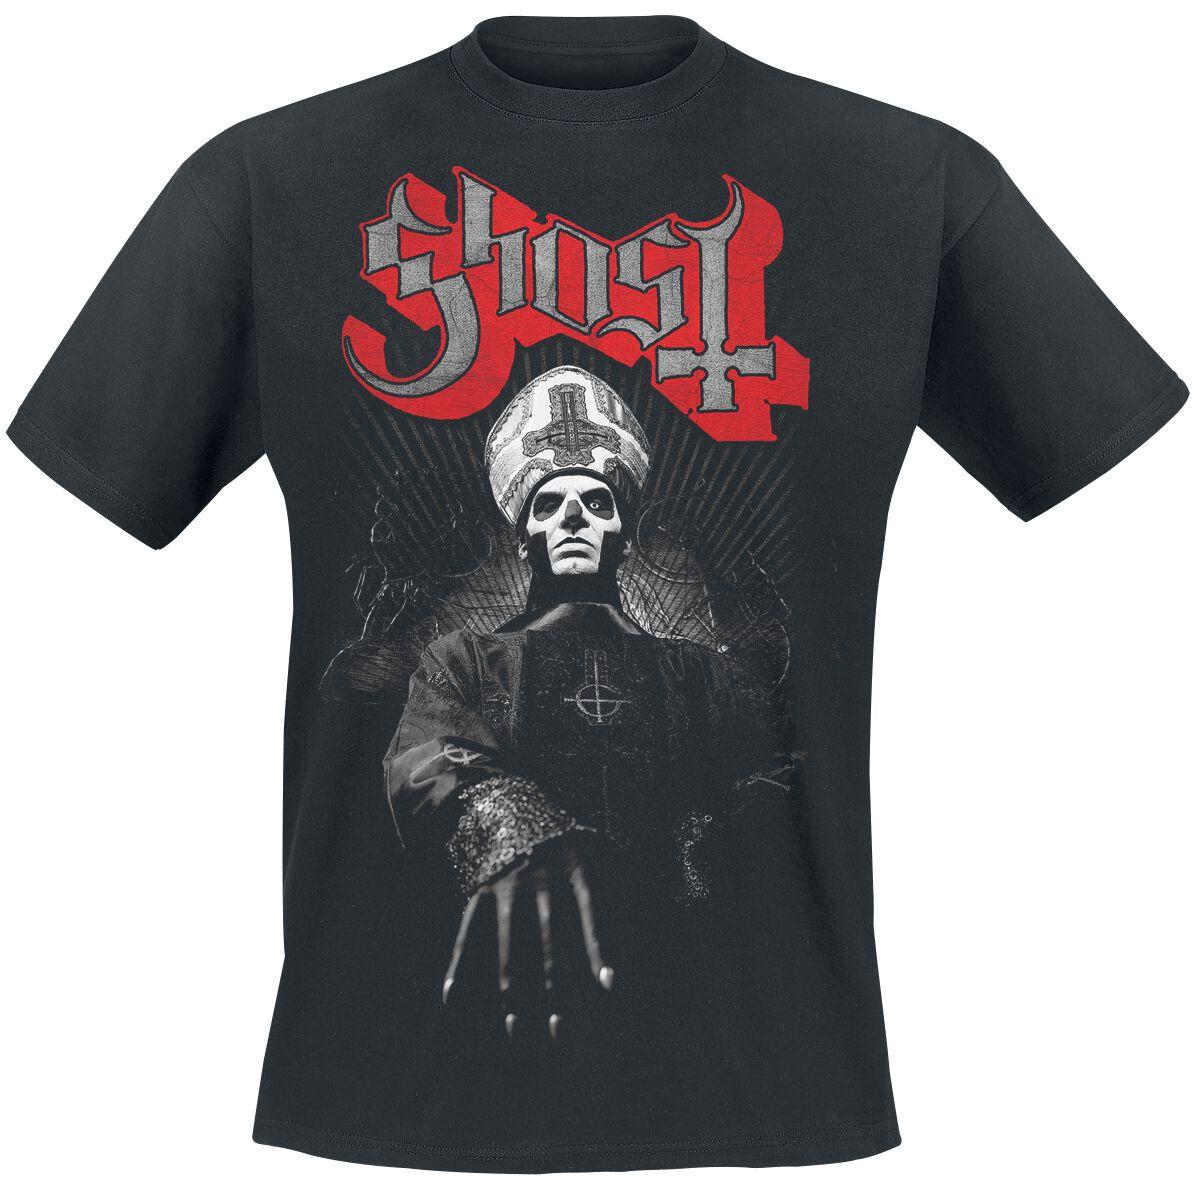 Zespoły - Koszulki - T-Shirt Ghost Ring Photo T-Shirt czarny - 341214